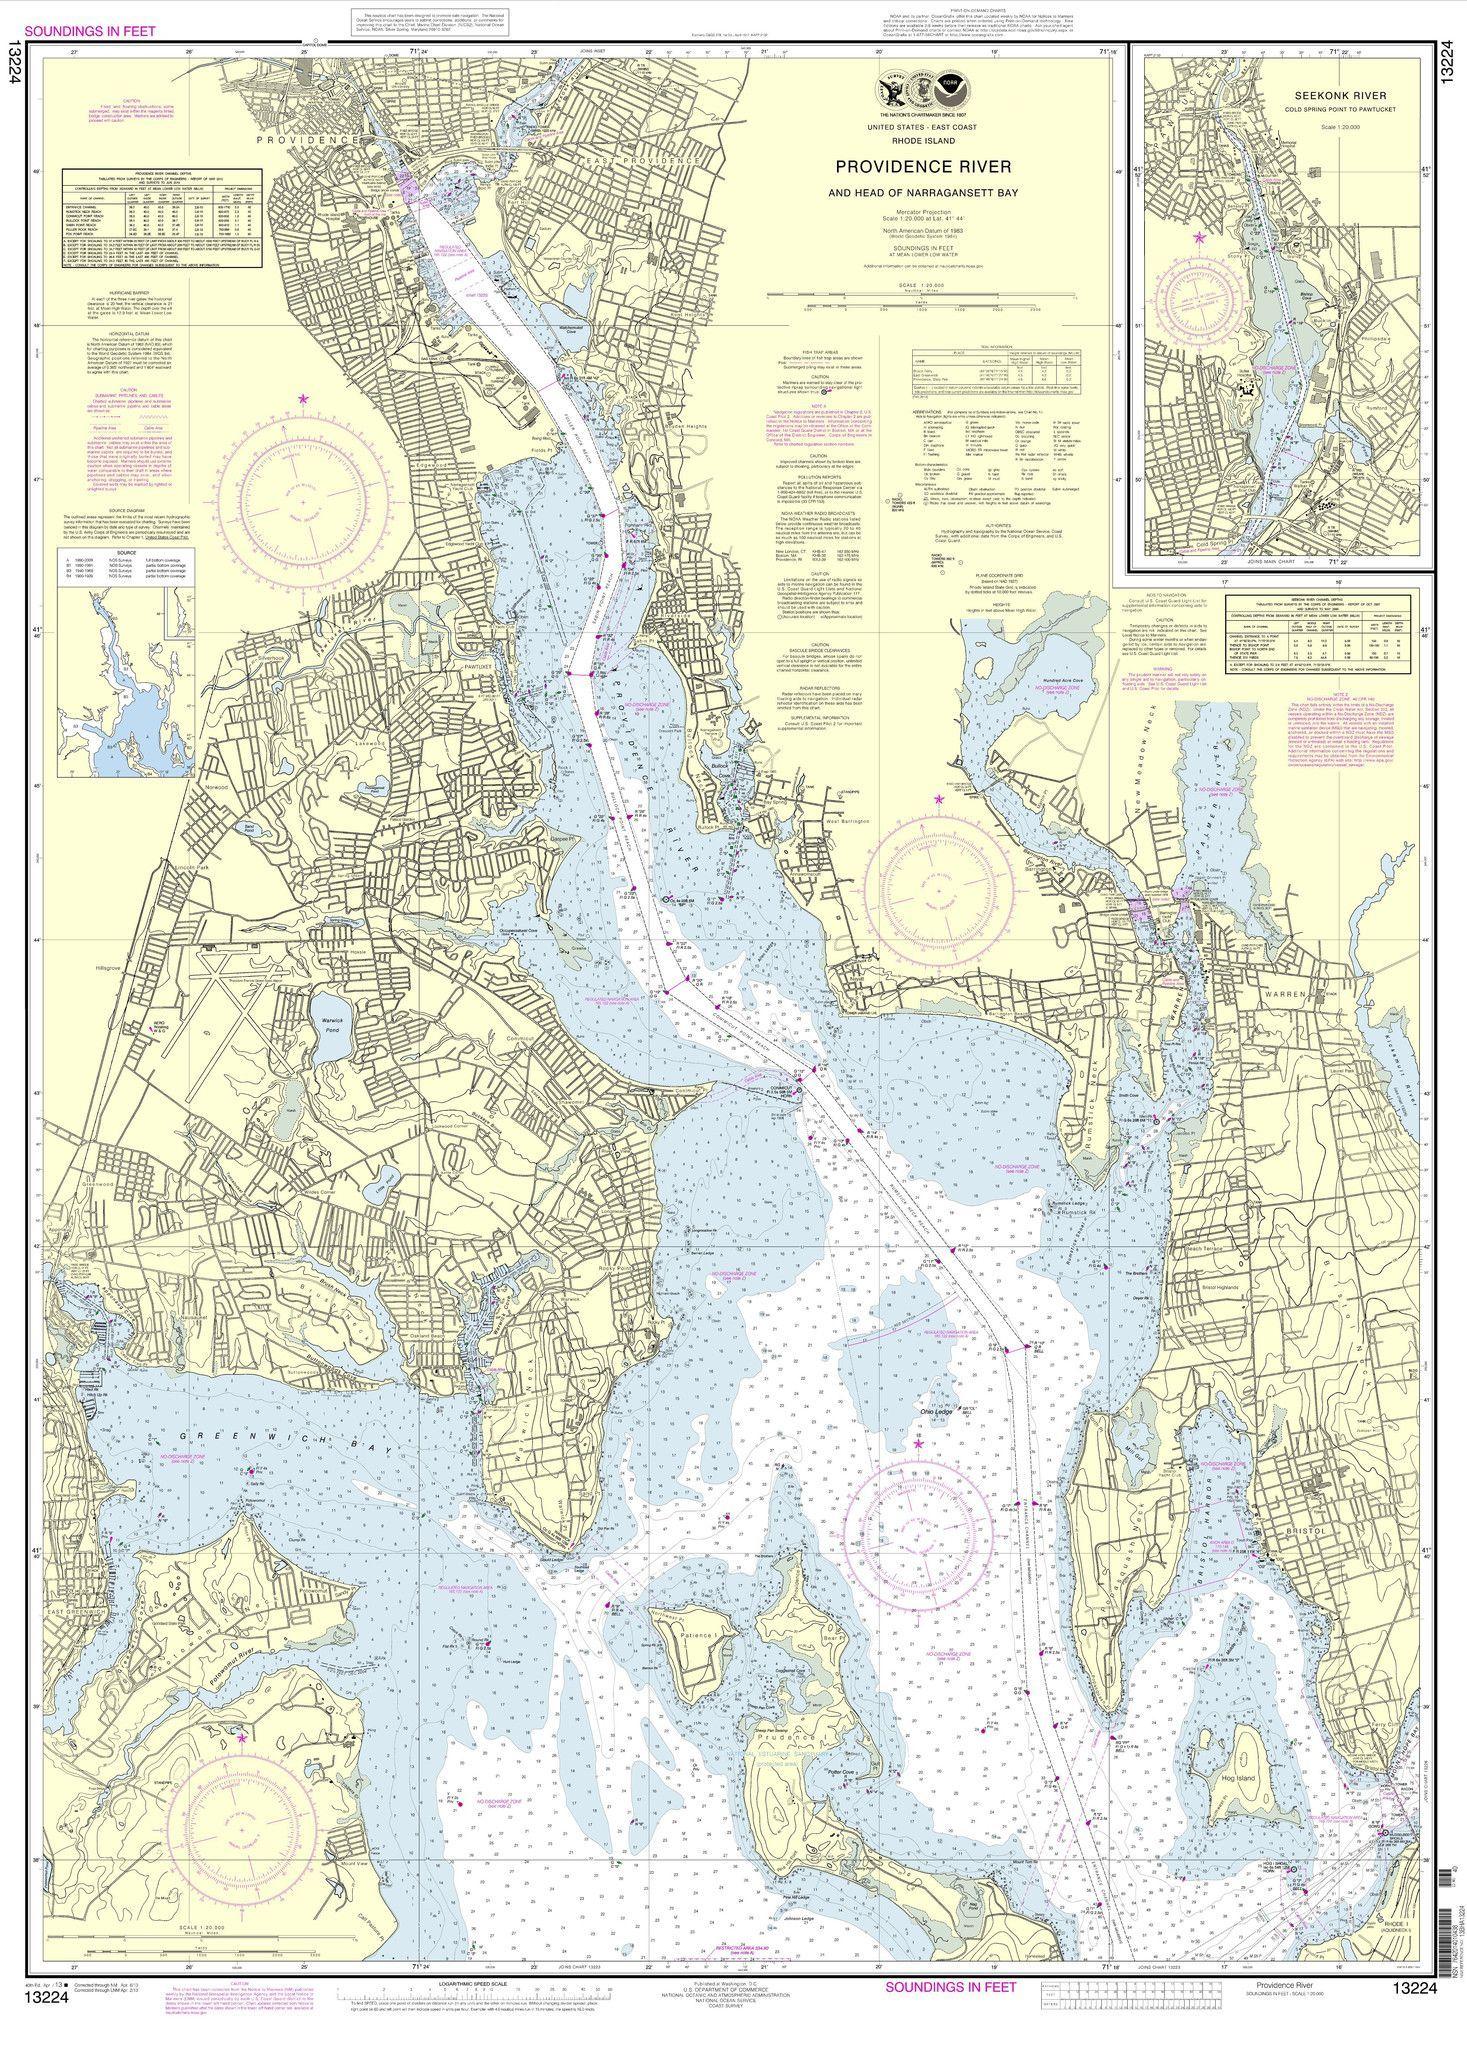 Noaa nautical chart 13224 providence river and head of narragansett noaa nautical chart 13224 providence river and head of narragansett bay gumiabroncs Images